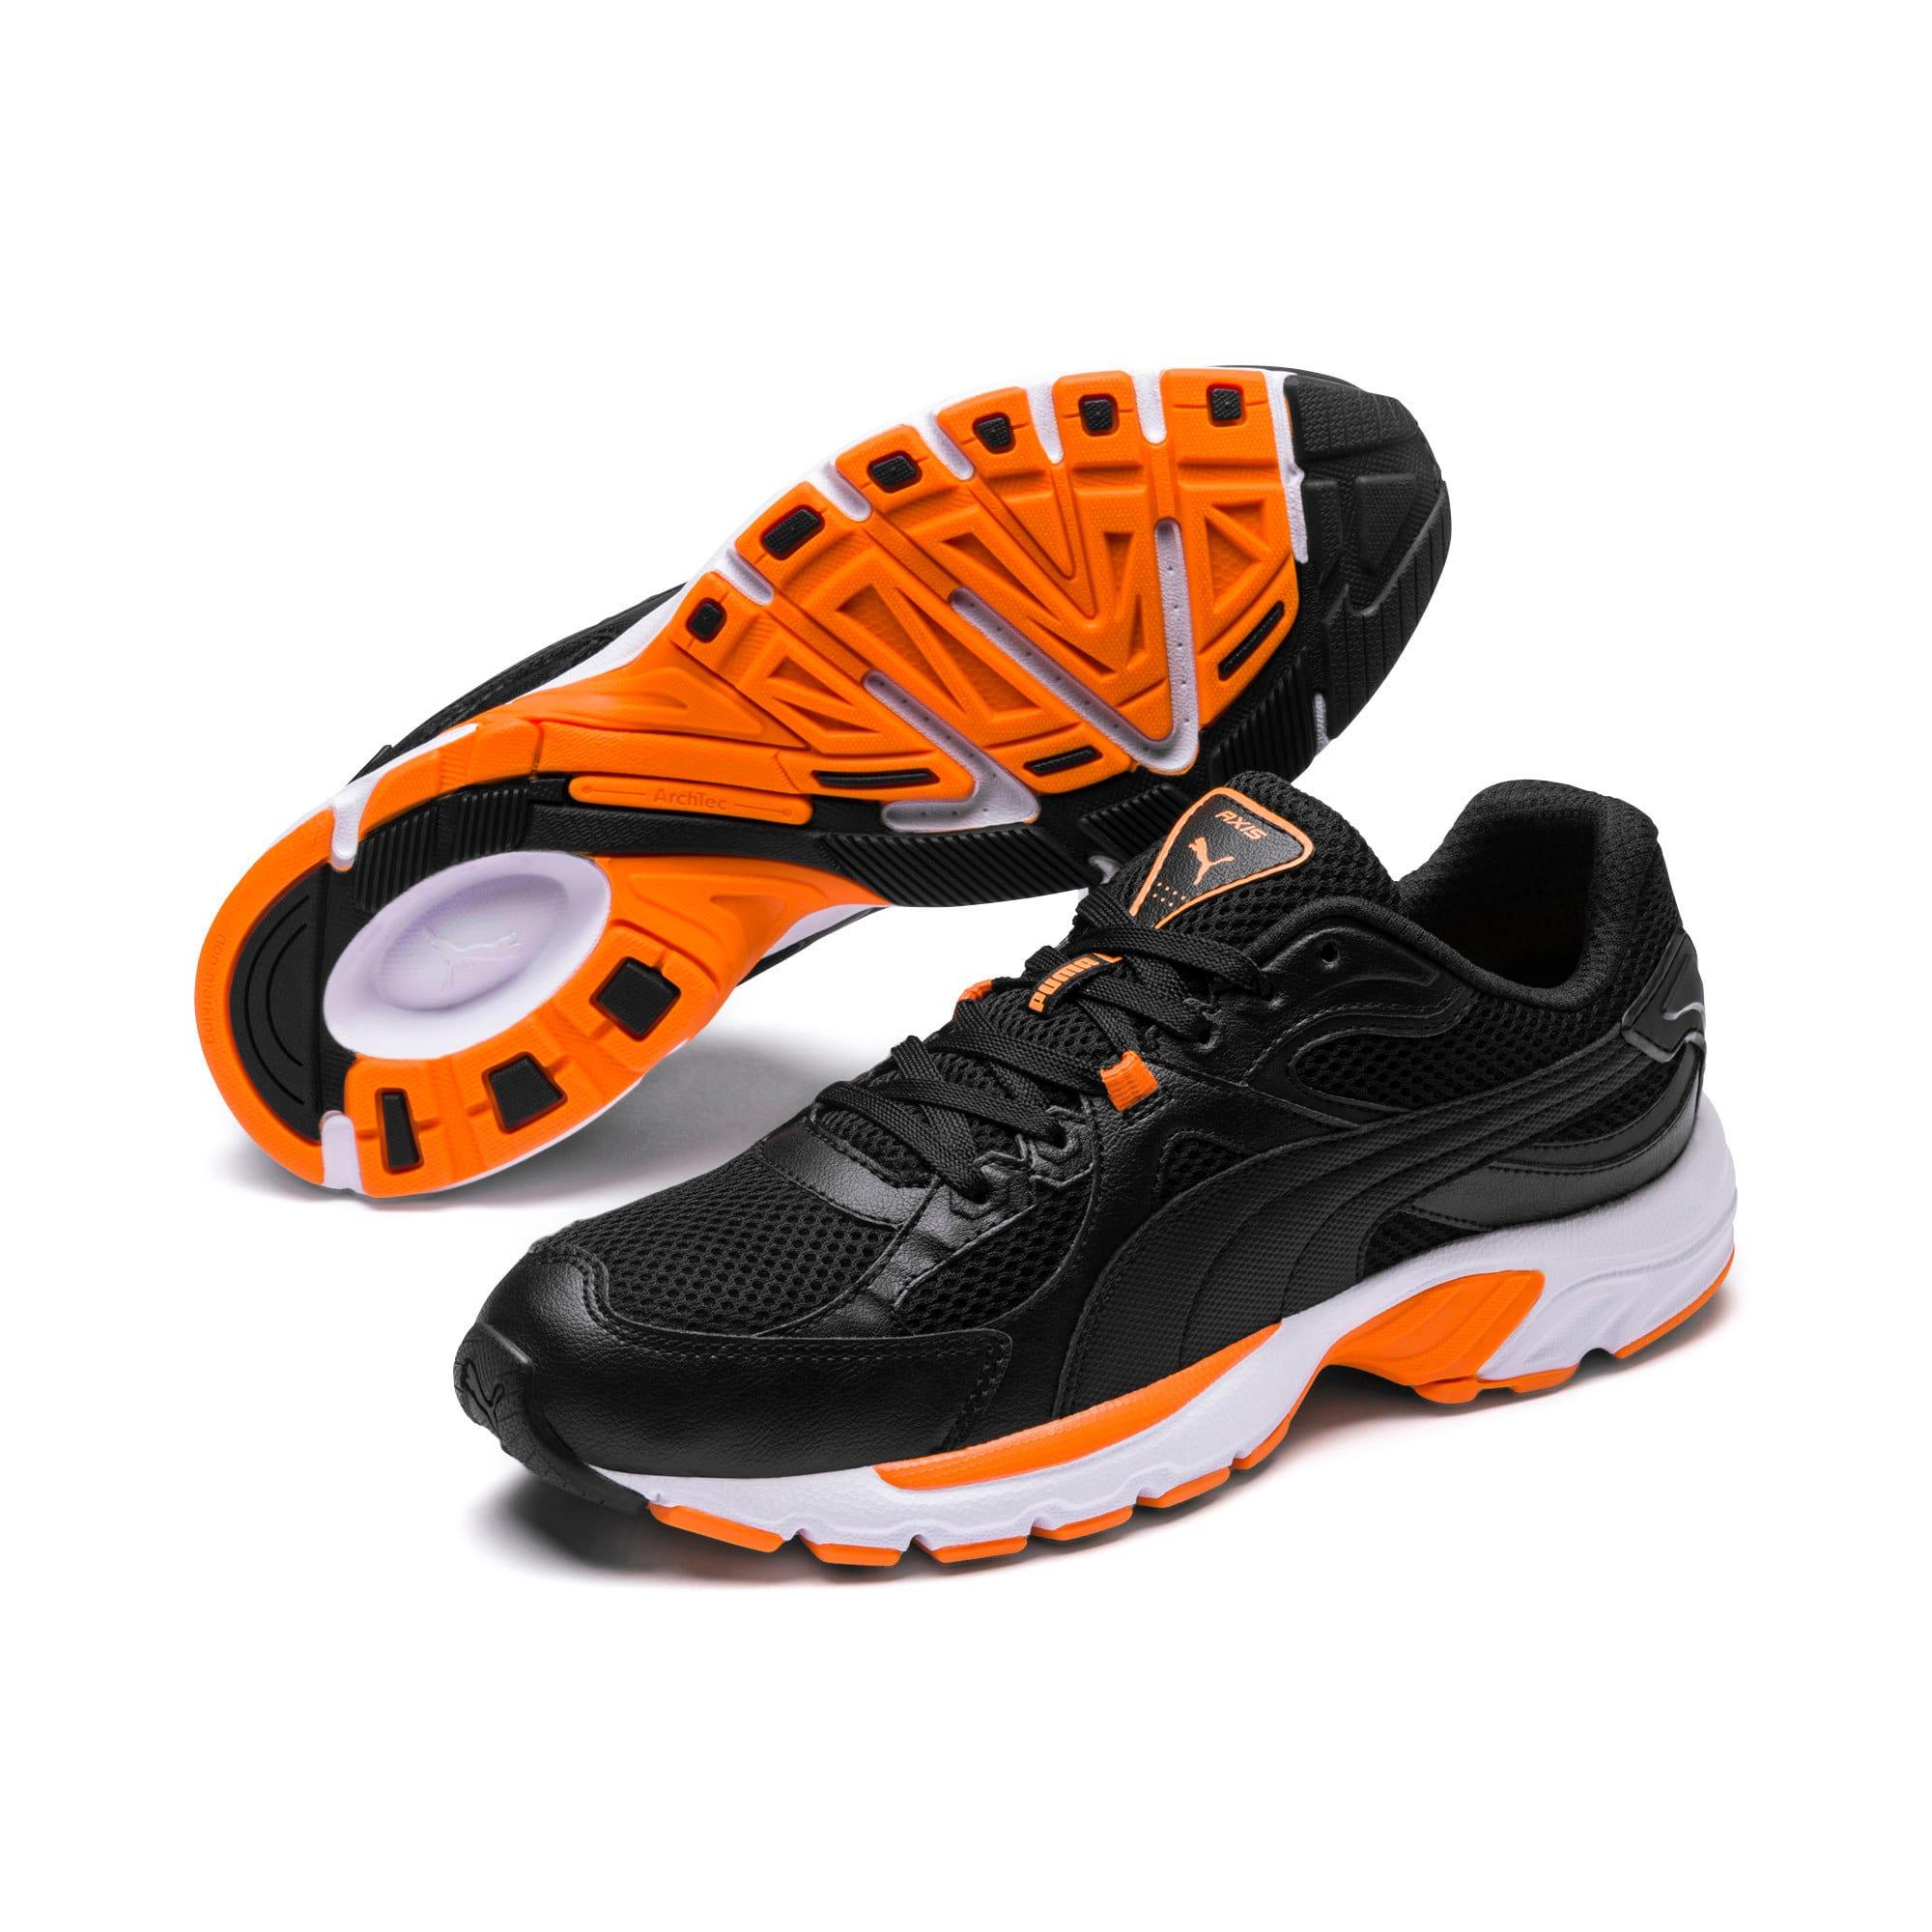 Thumbnail 2 of Axis Plus 90s Sneakers, Puma Black-Puma Black, medium